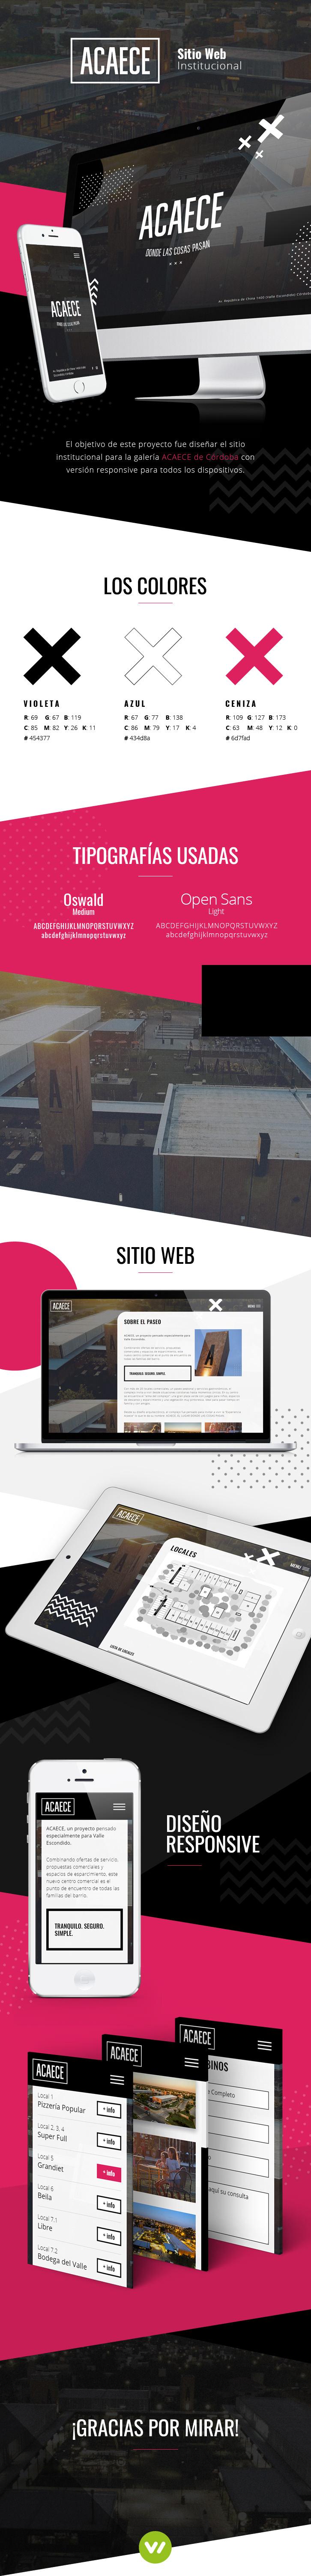 Sitio Web para Centros Comerciales